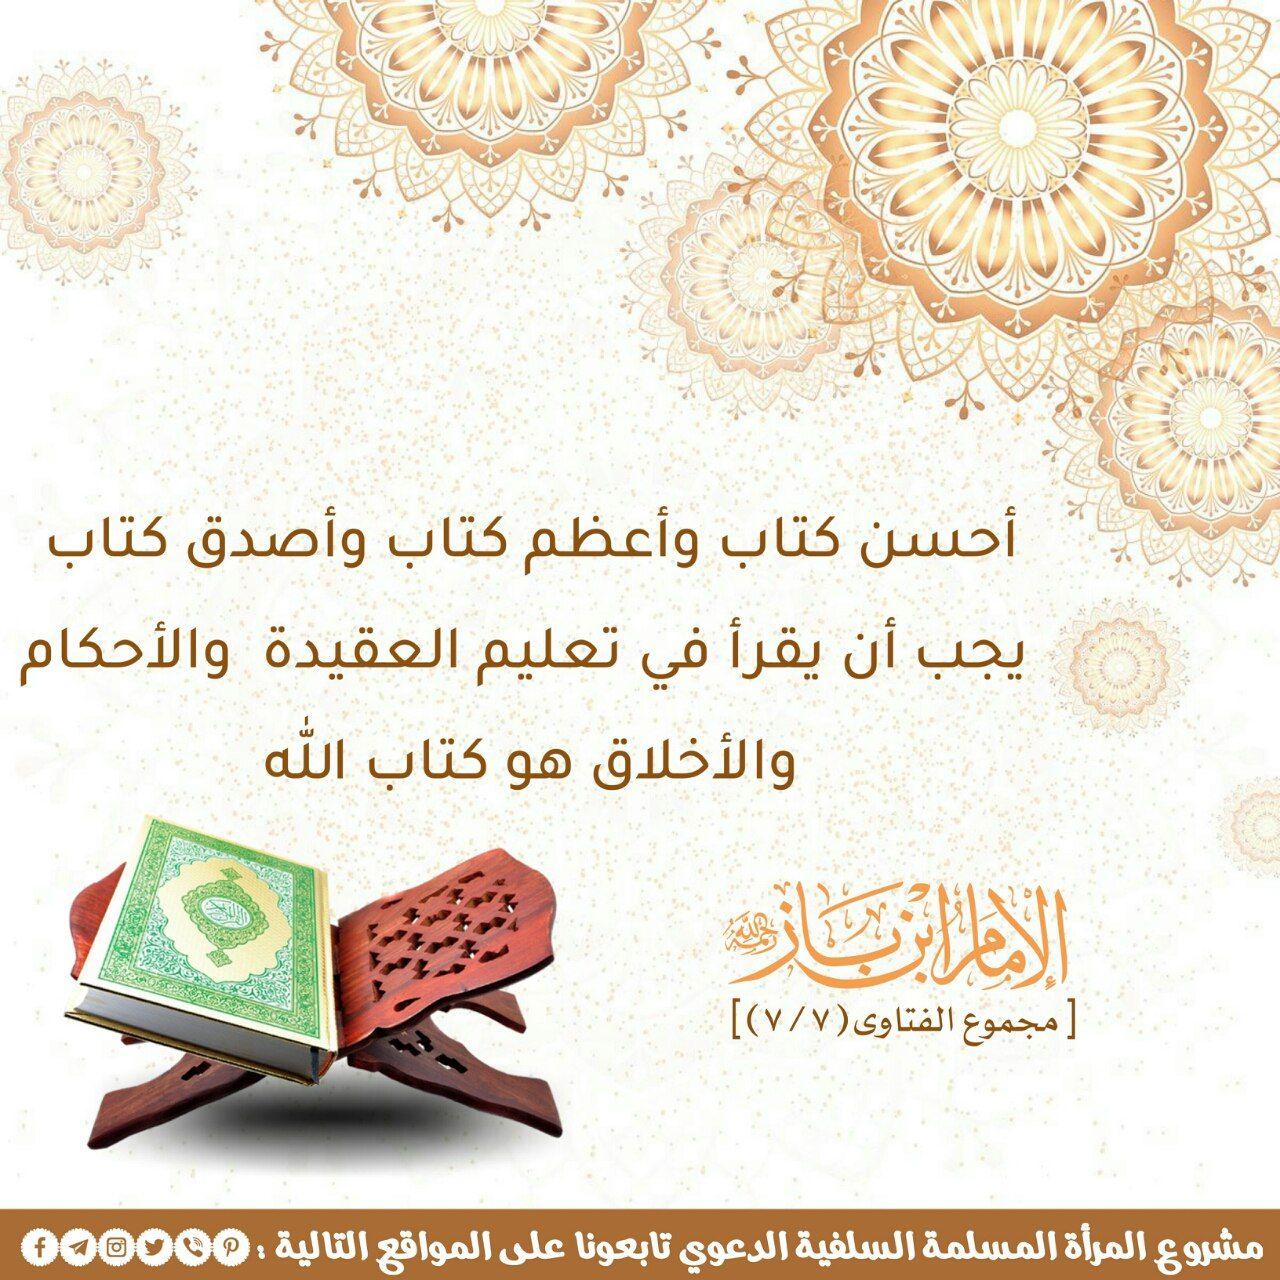 Pin By المرأة المسلمة On أقوال العلماء Place Card Holders Place Cards Cards